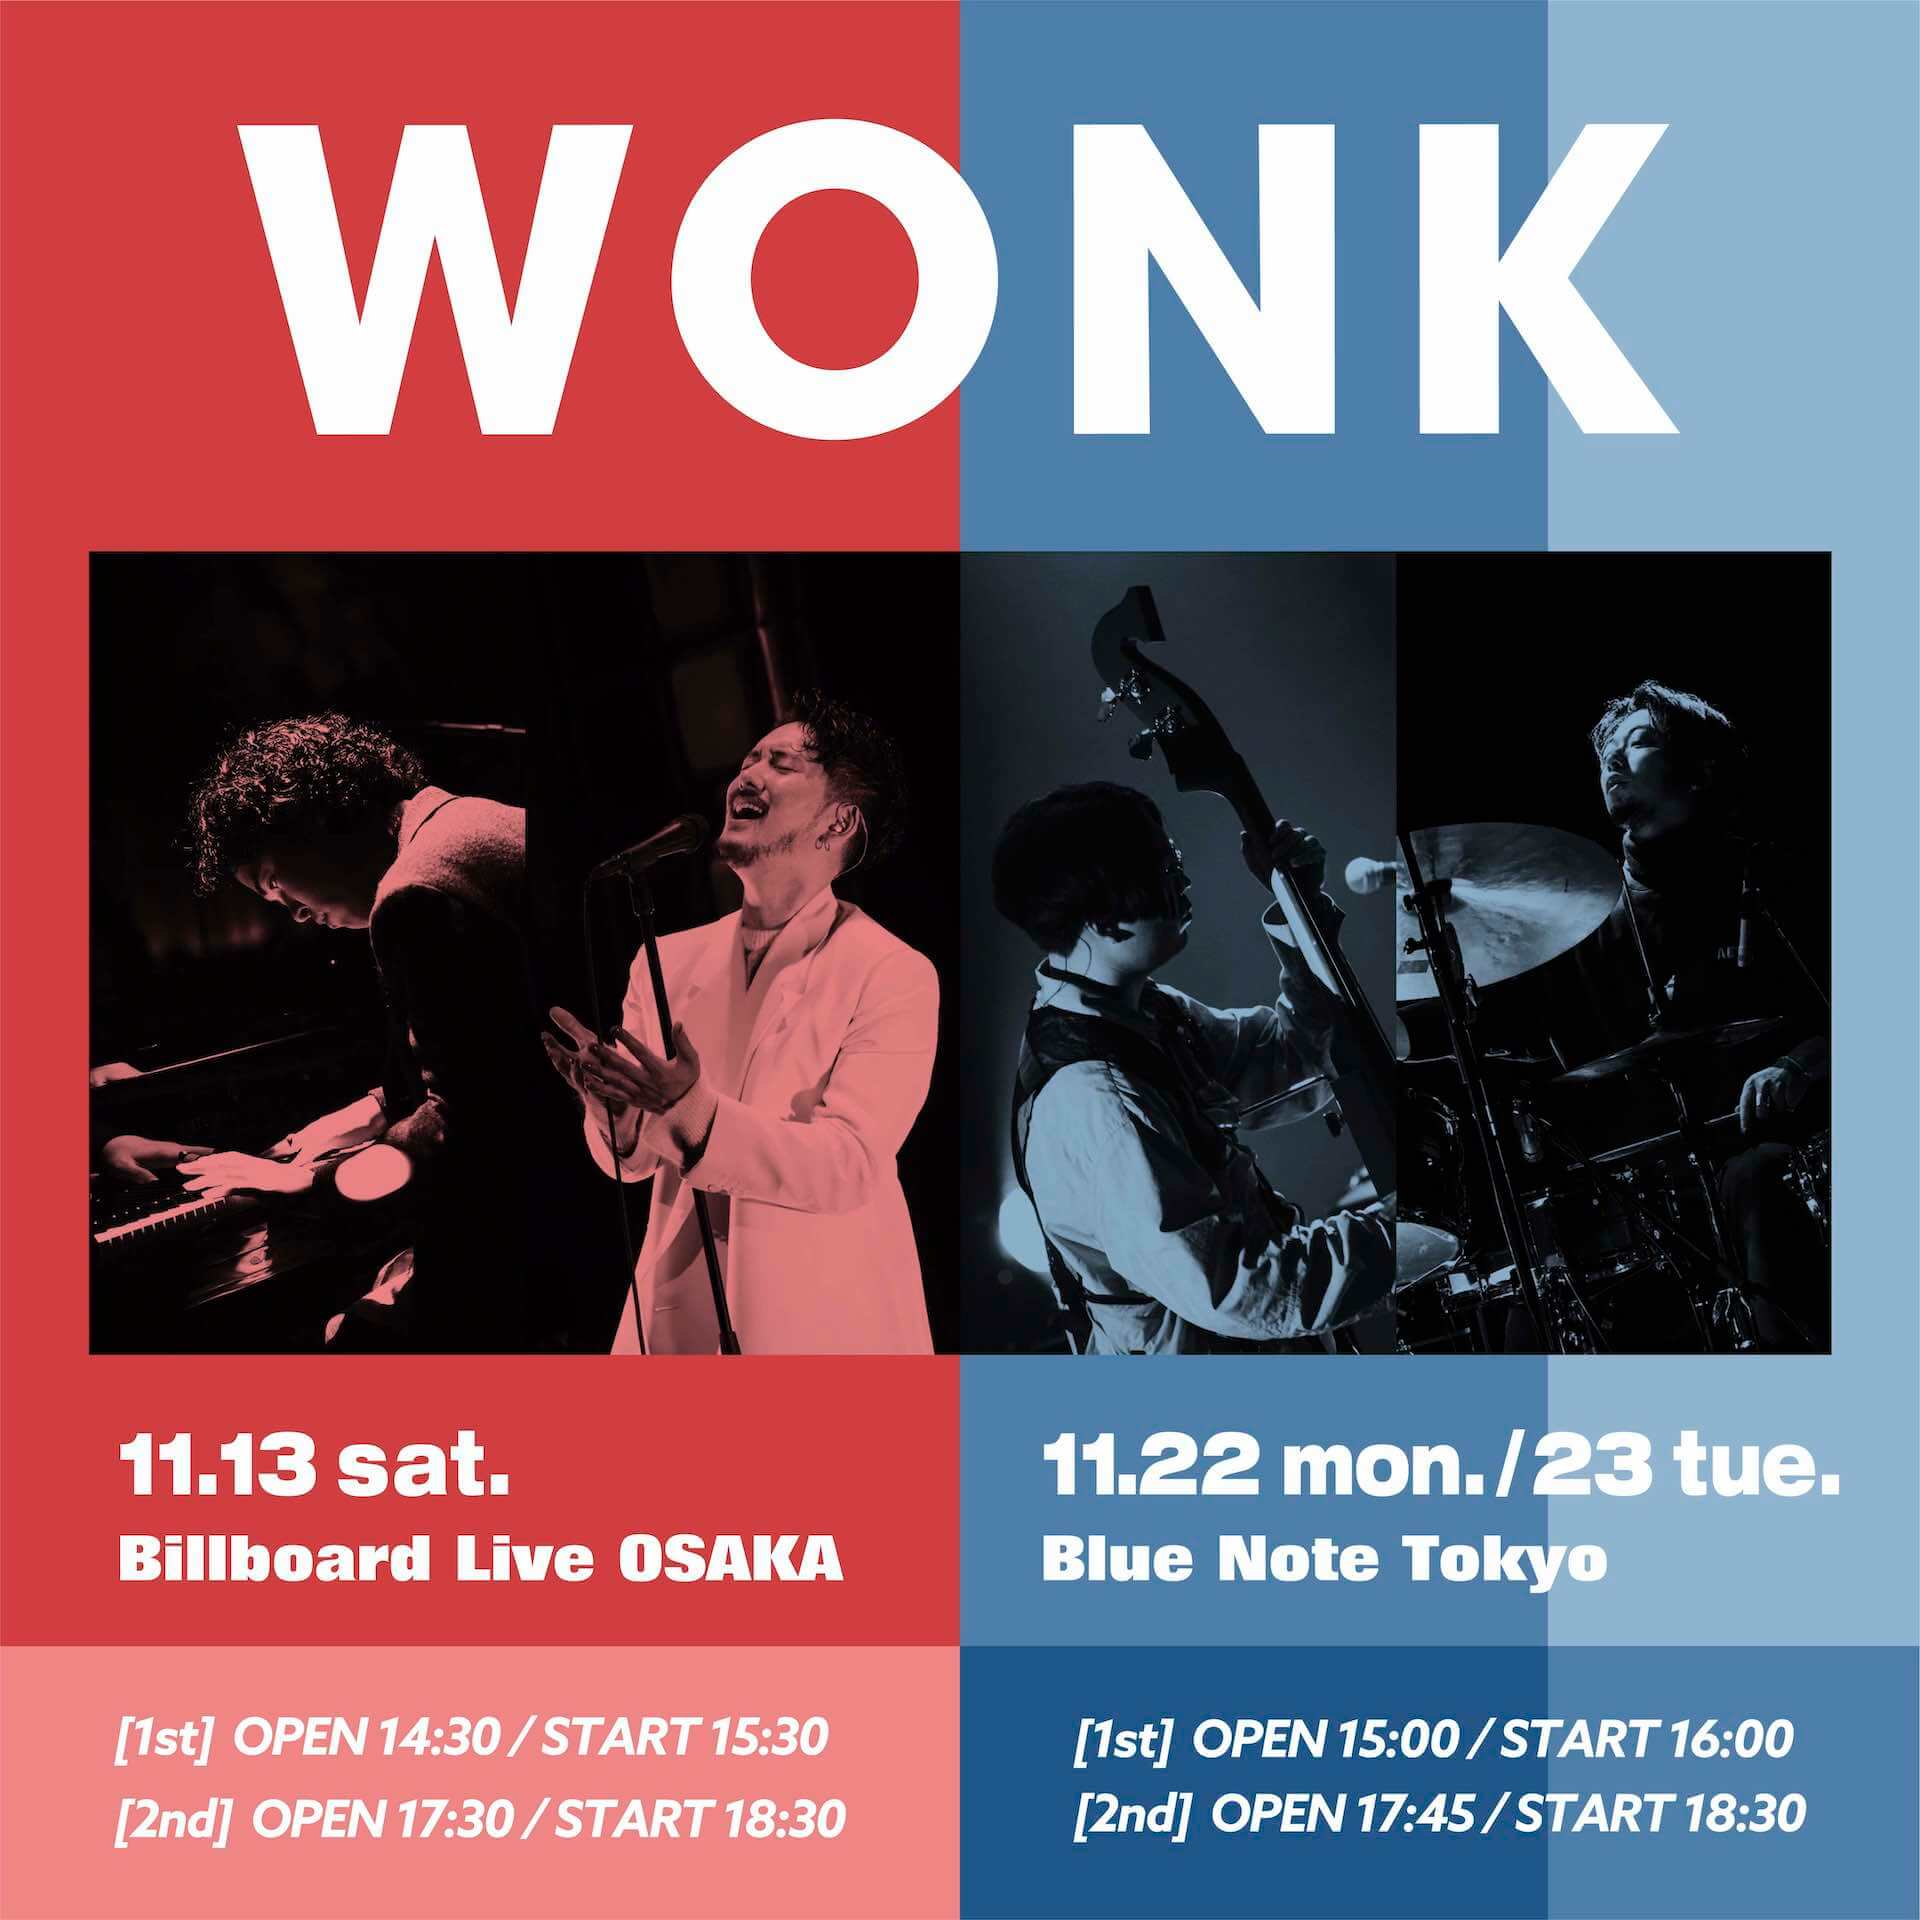 WONKがビルボードライブ大阪&ブルーノート東京で計6公演開催!オフィシャルアプリ「WONK LAB」で本日よりチケット発売 music210916_wonk_main